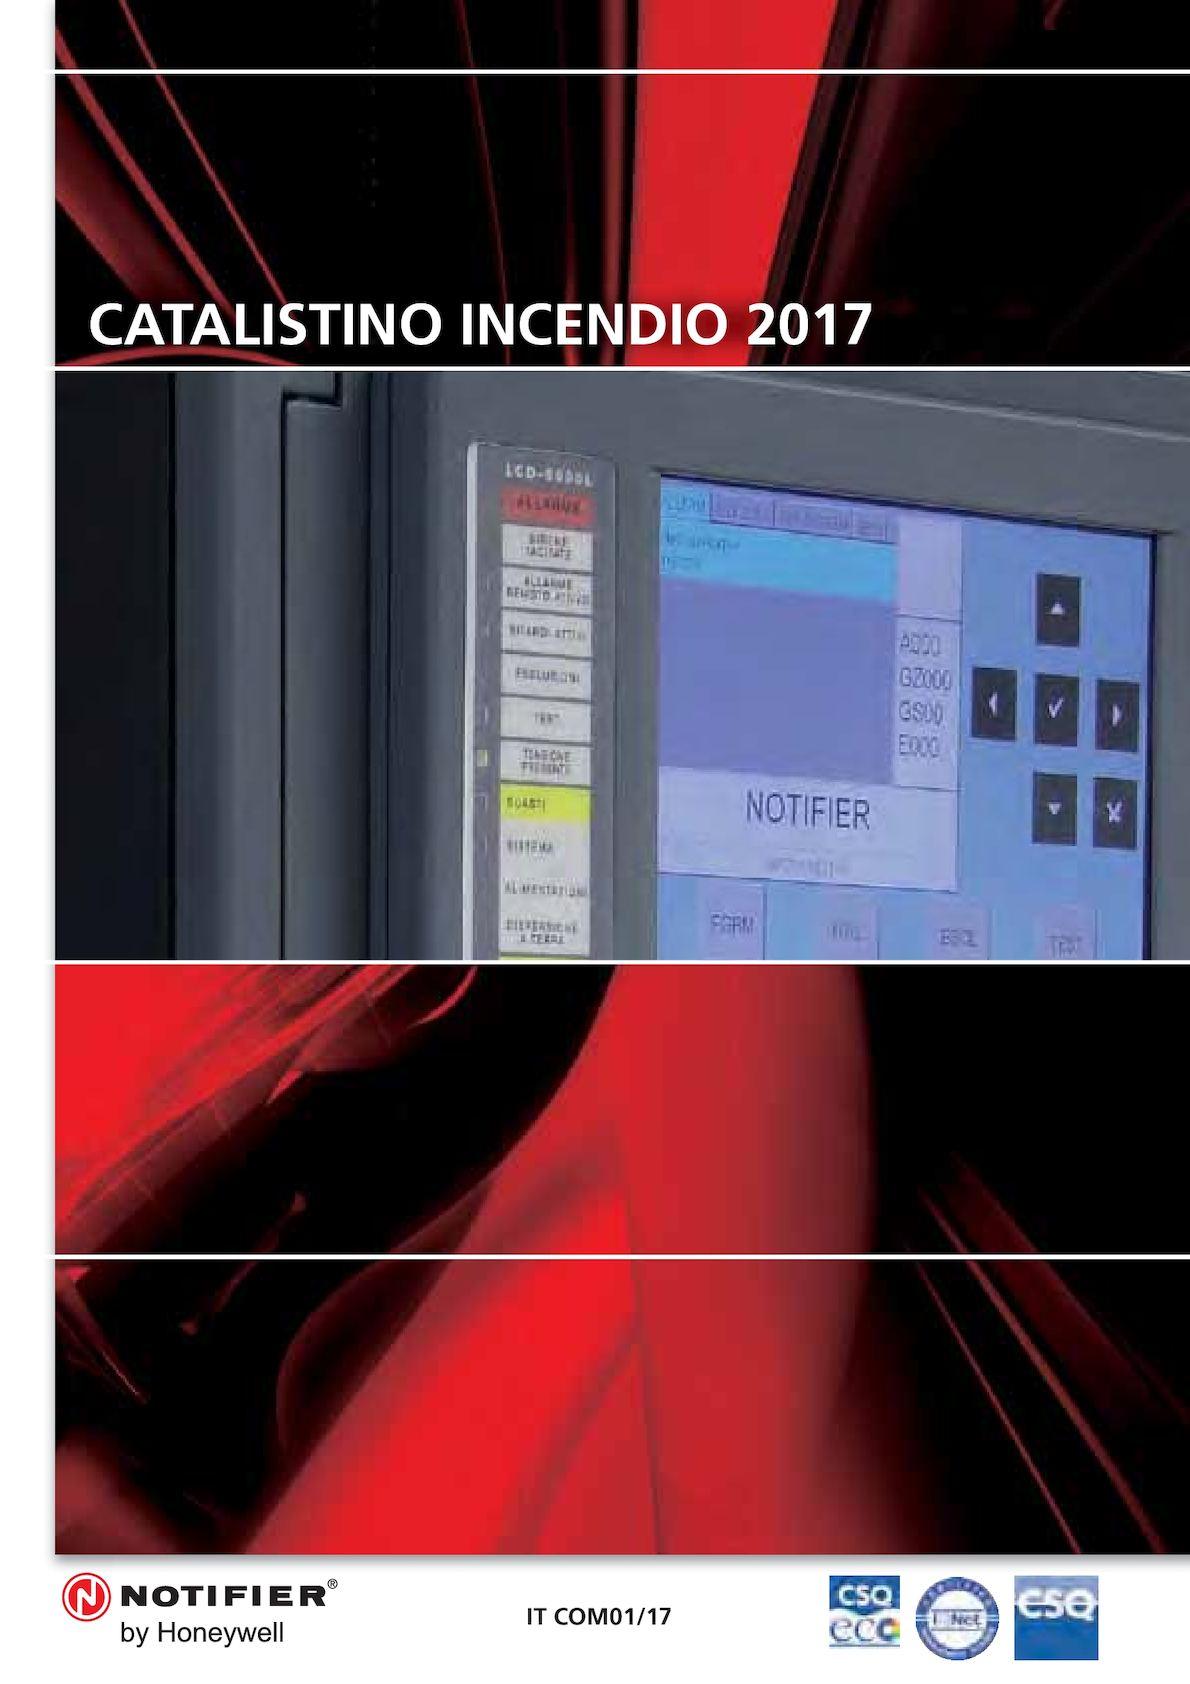 Schemi Elettrici Notifier : Calaméo listino notifier antincendio